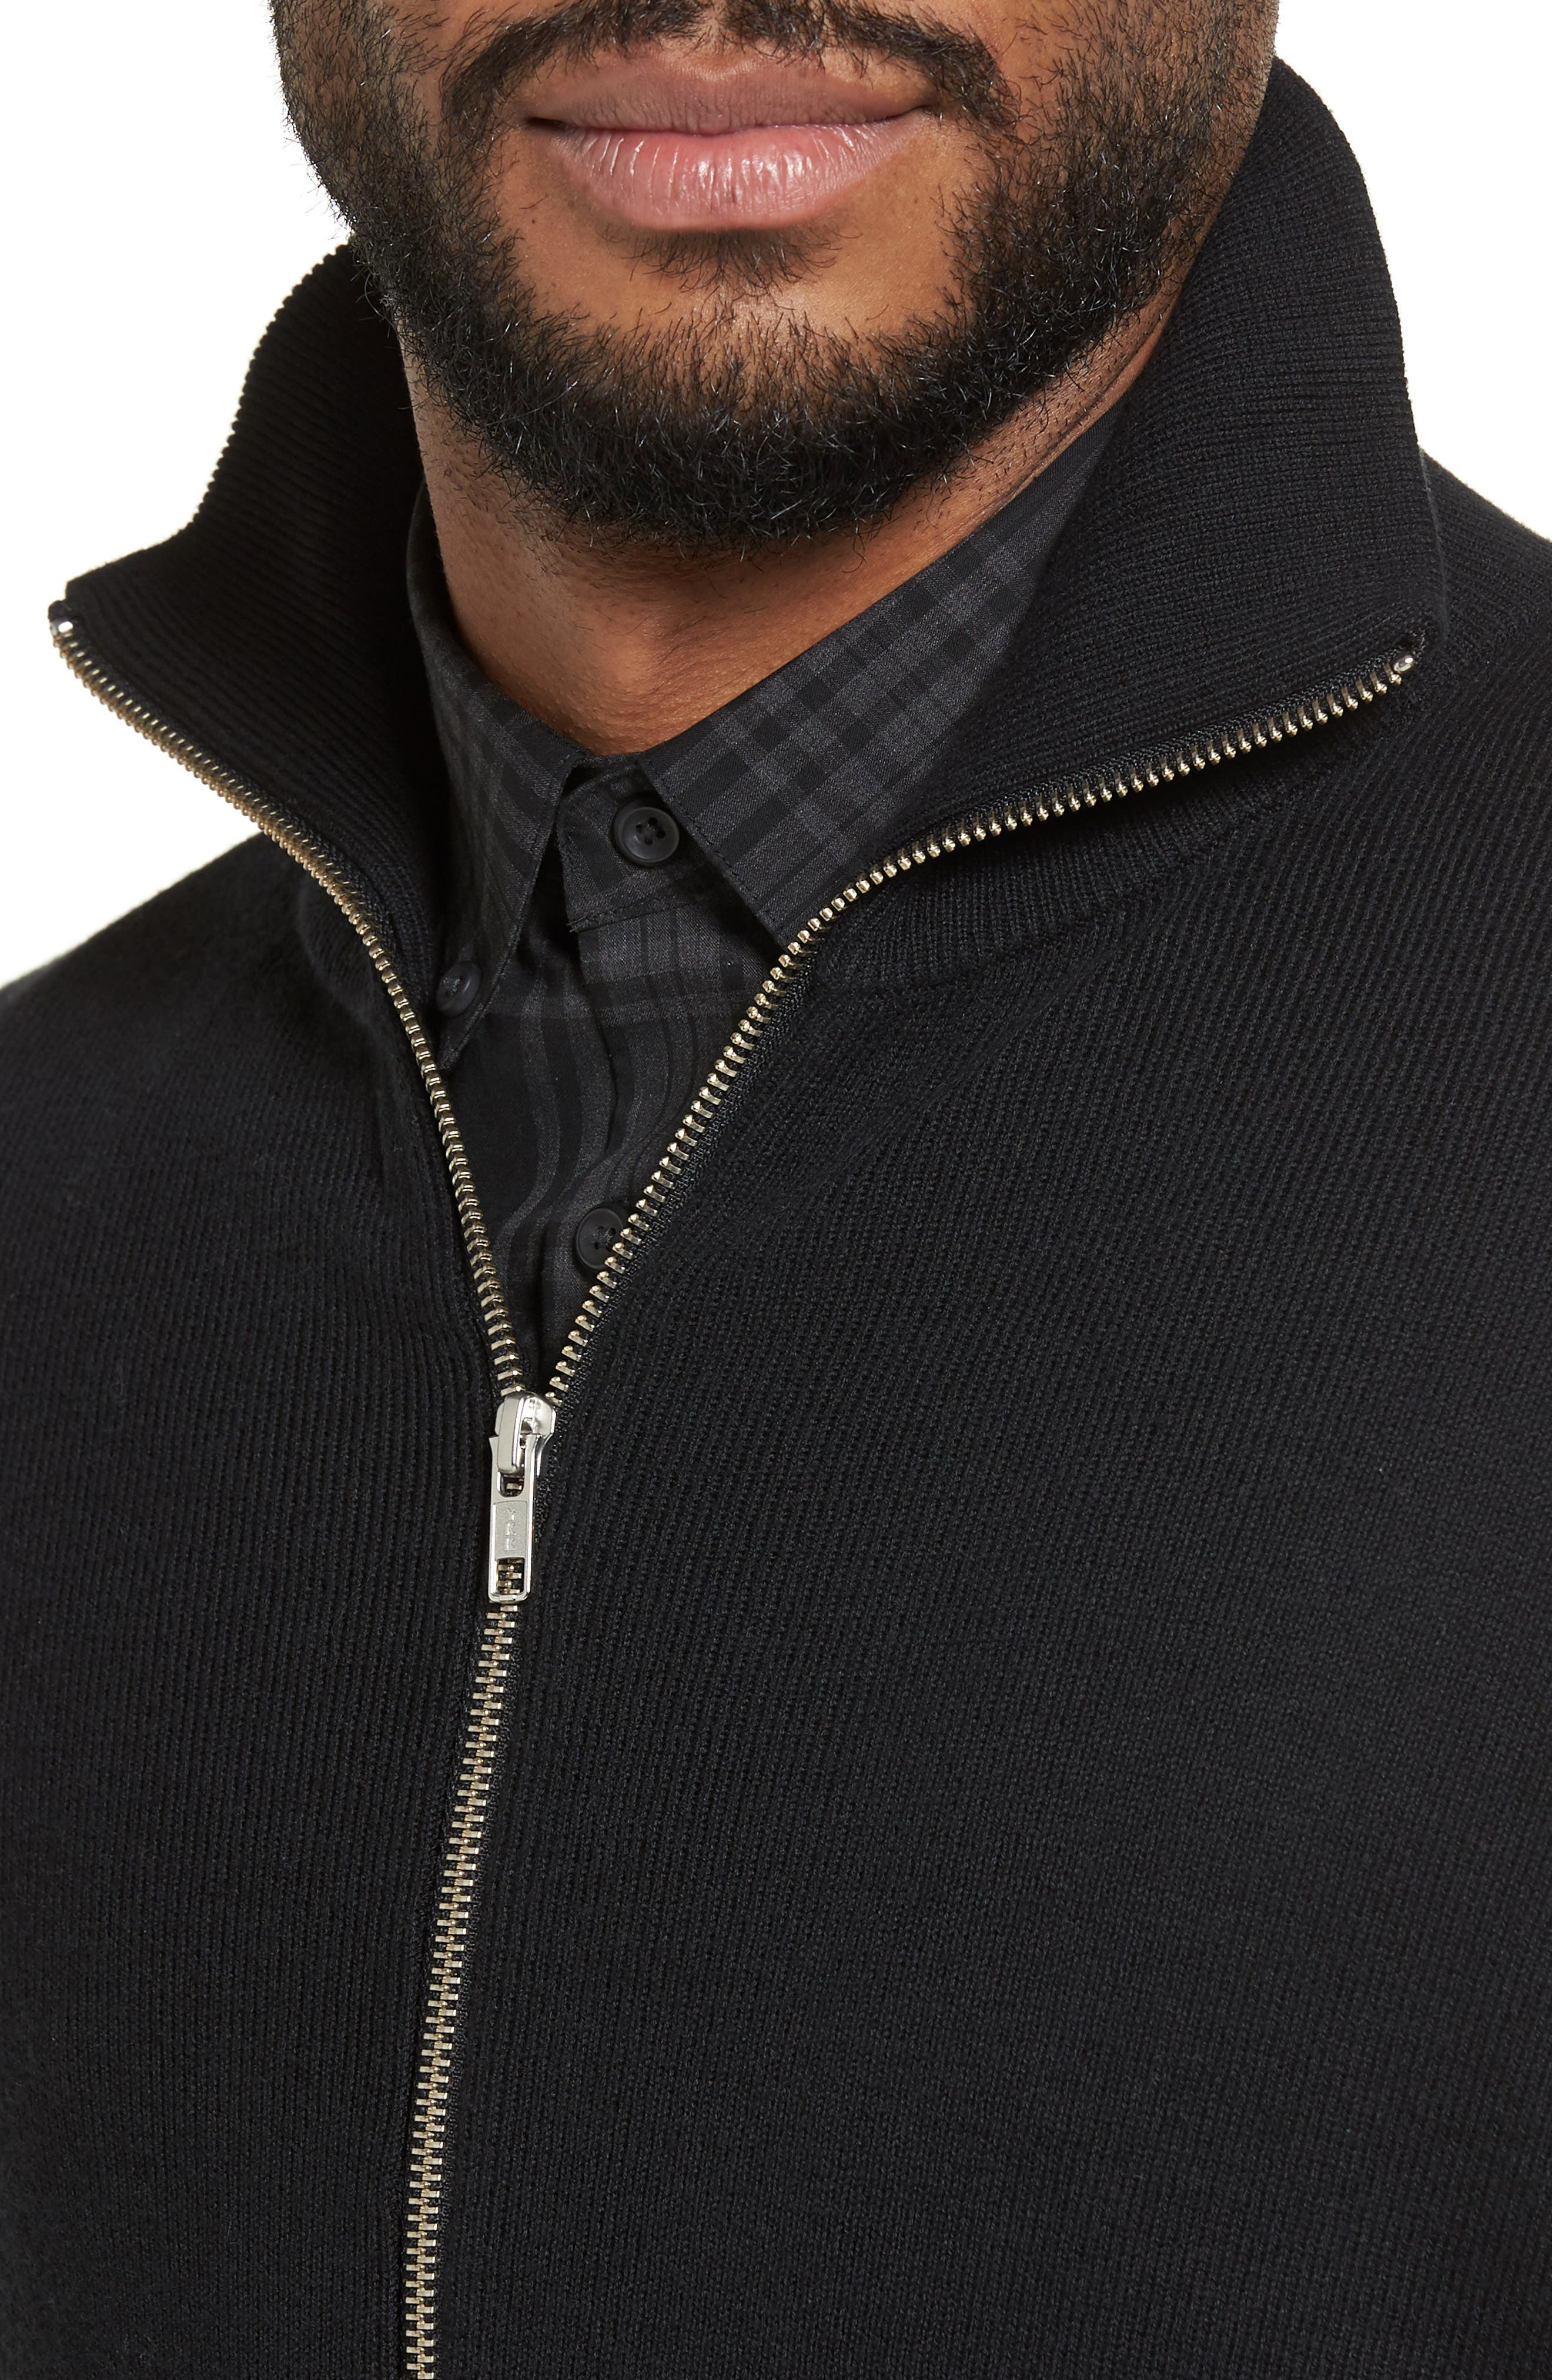 Zip Front Sweater Jacket,                             Alternate thumbnail 4, color,                             BLACK